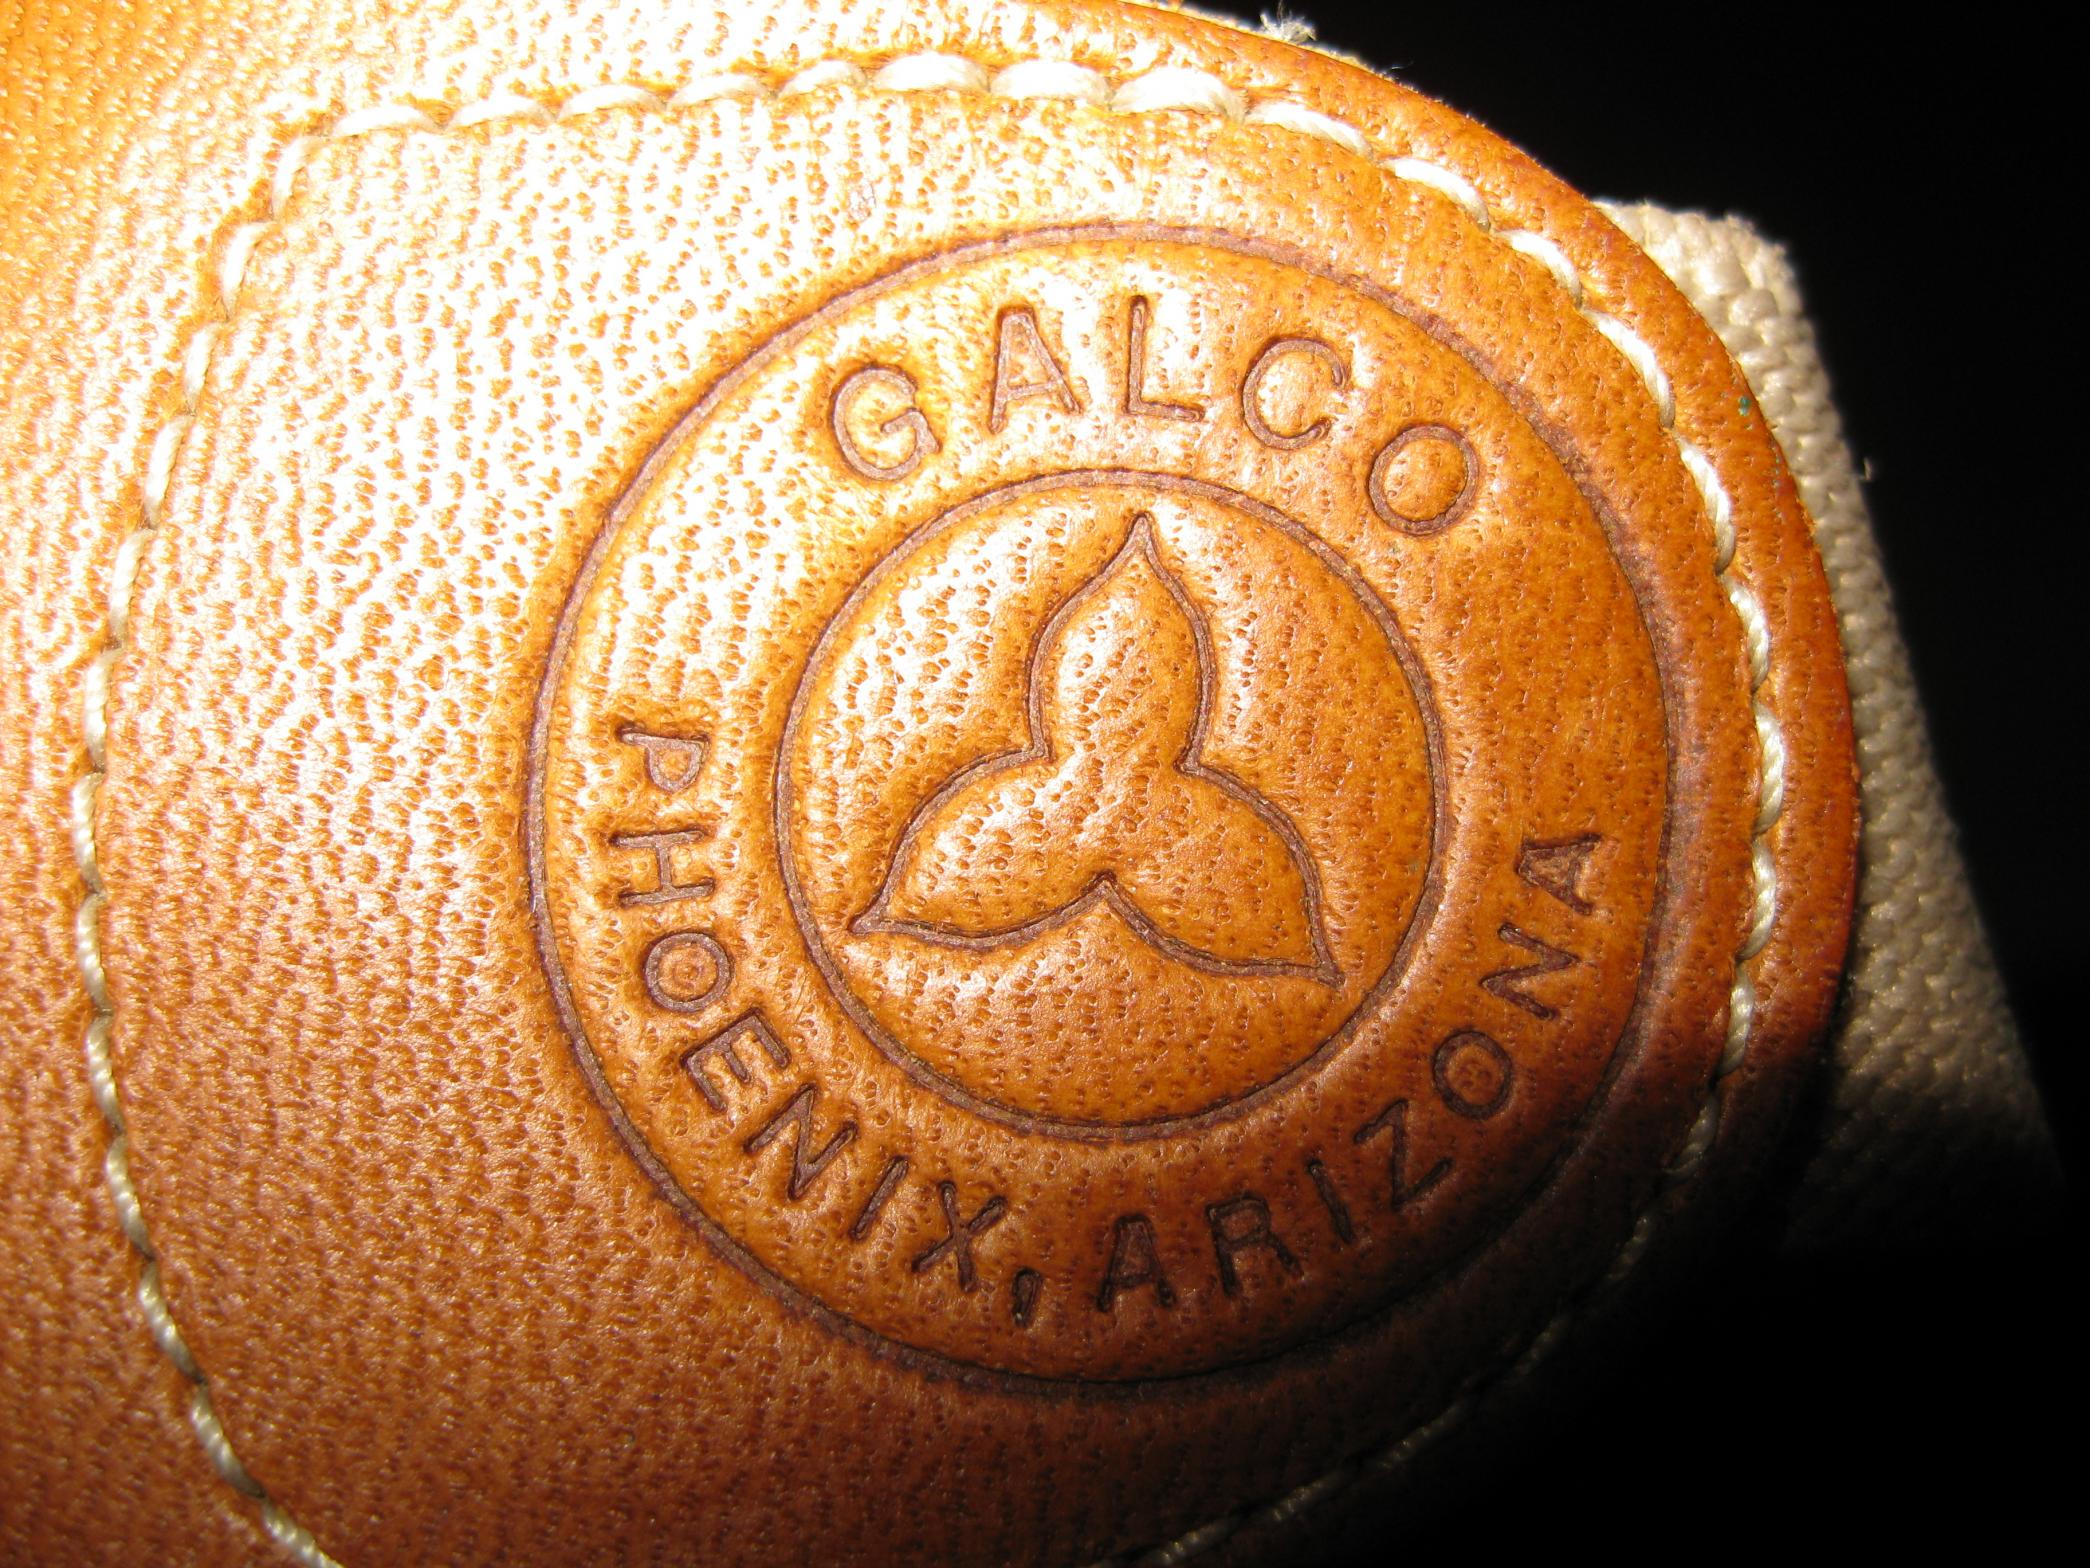 GALCO shoulder holster for sale..-img_0777.jpg